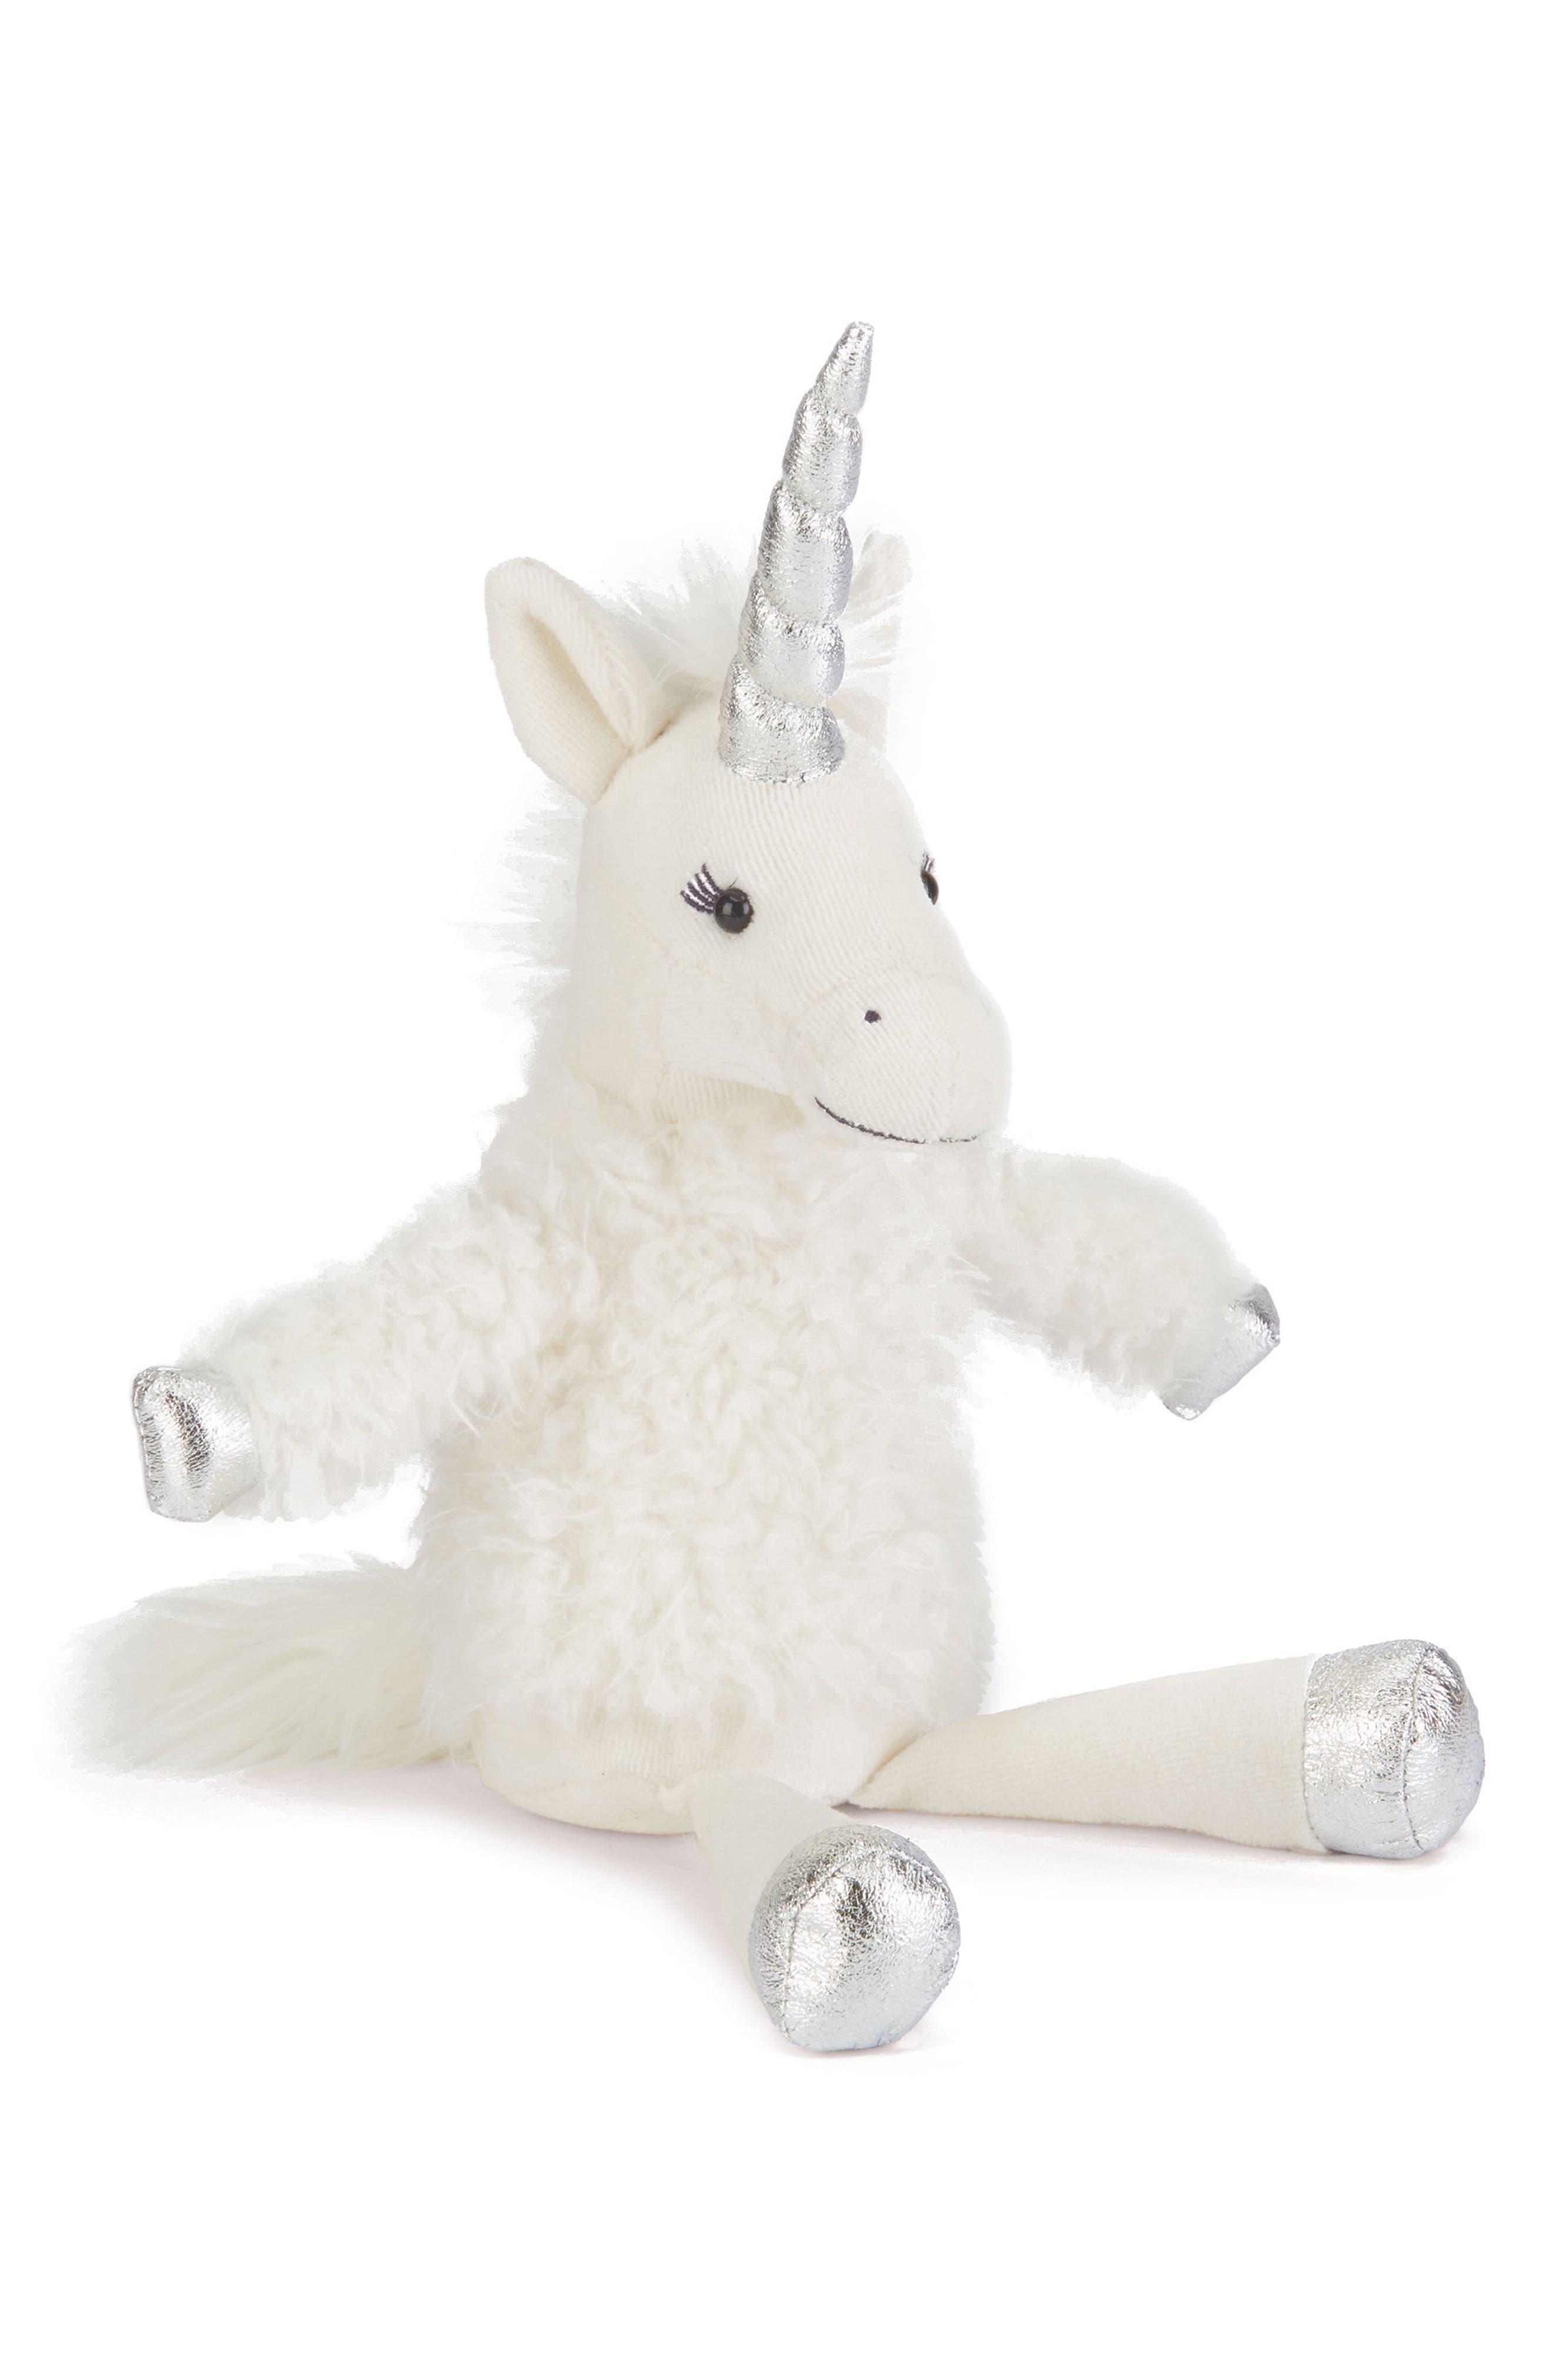 main image jellycat pearl the unicorn stuffed animal